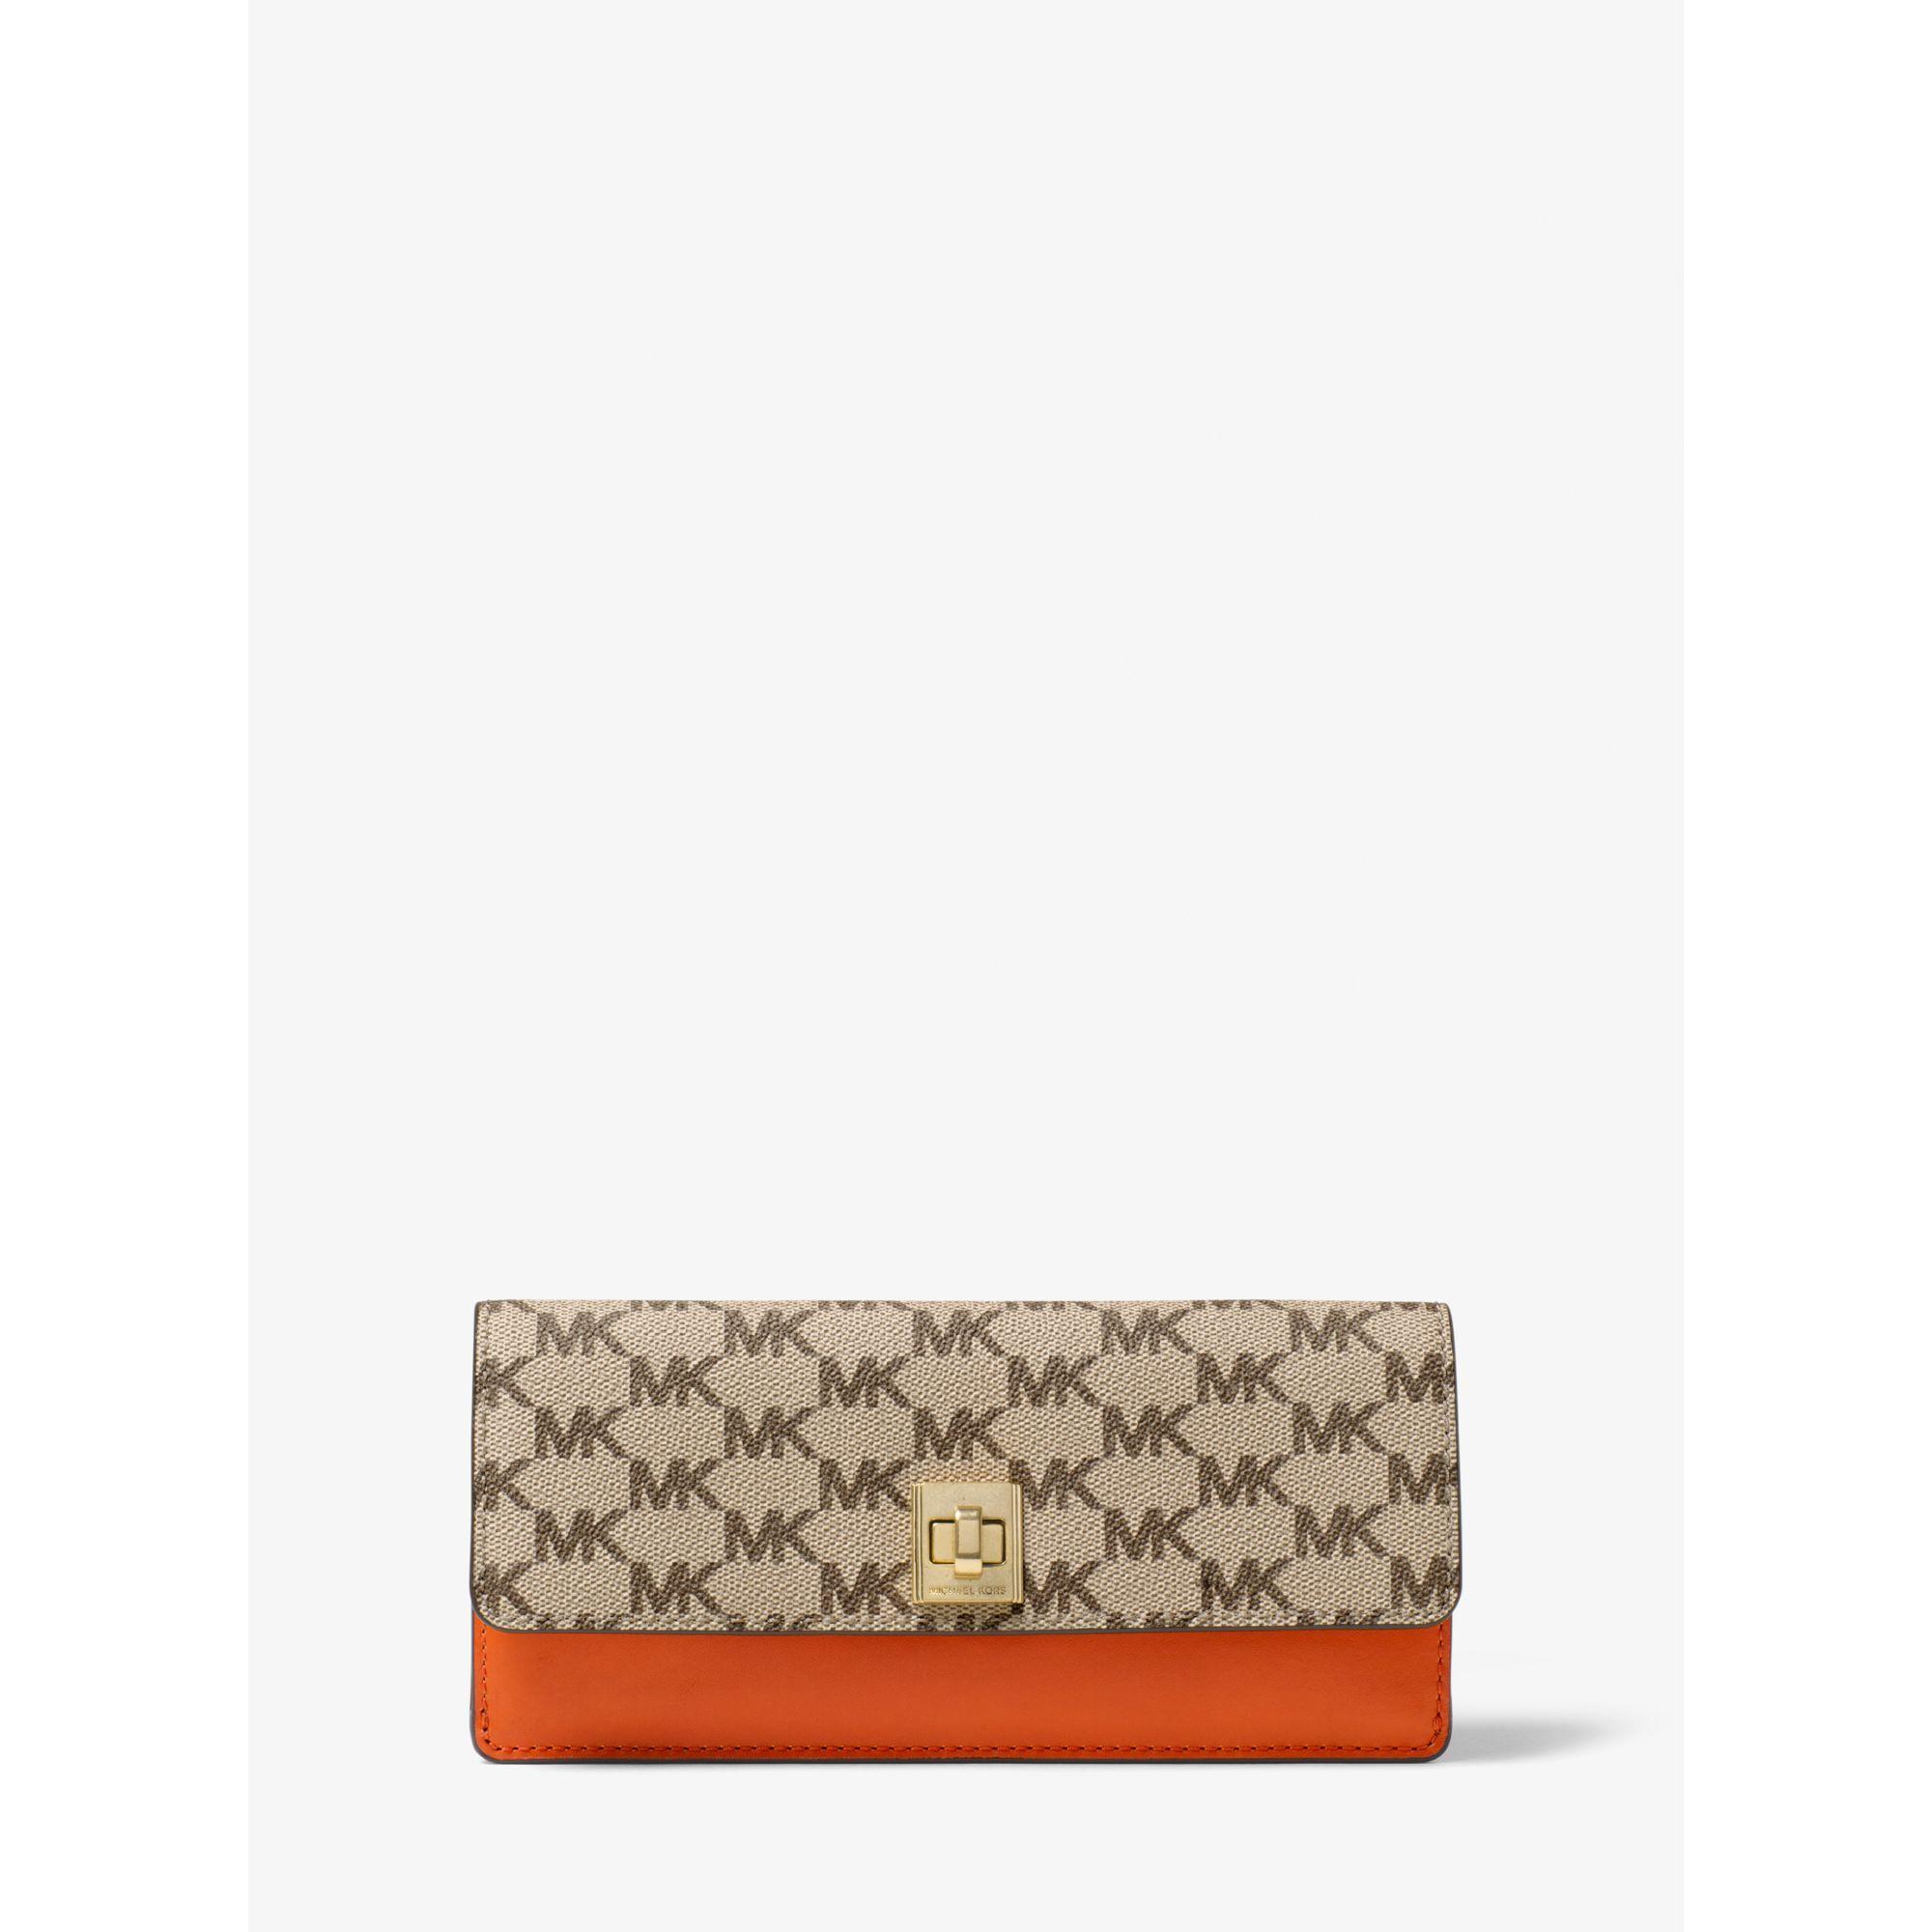 56e7953ec8e0 Lyst - Michael Kors Natalie Heritage Signature Logo Wallet in Orange